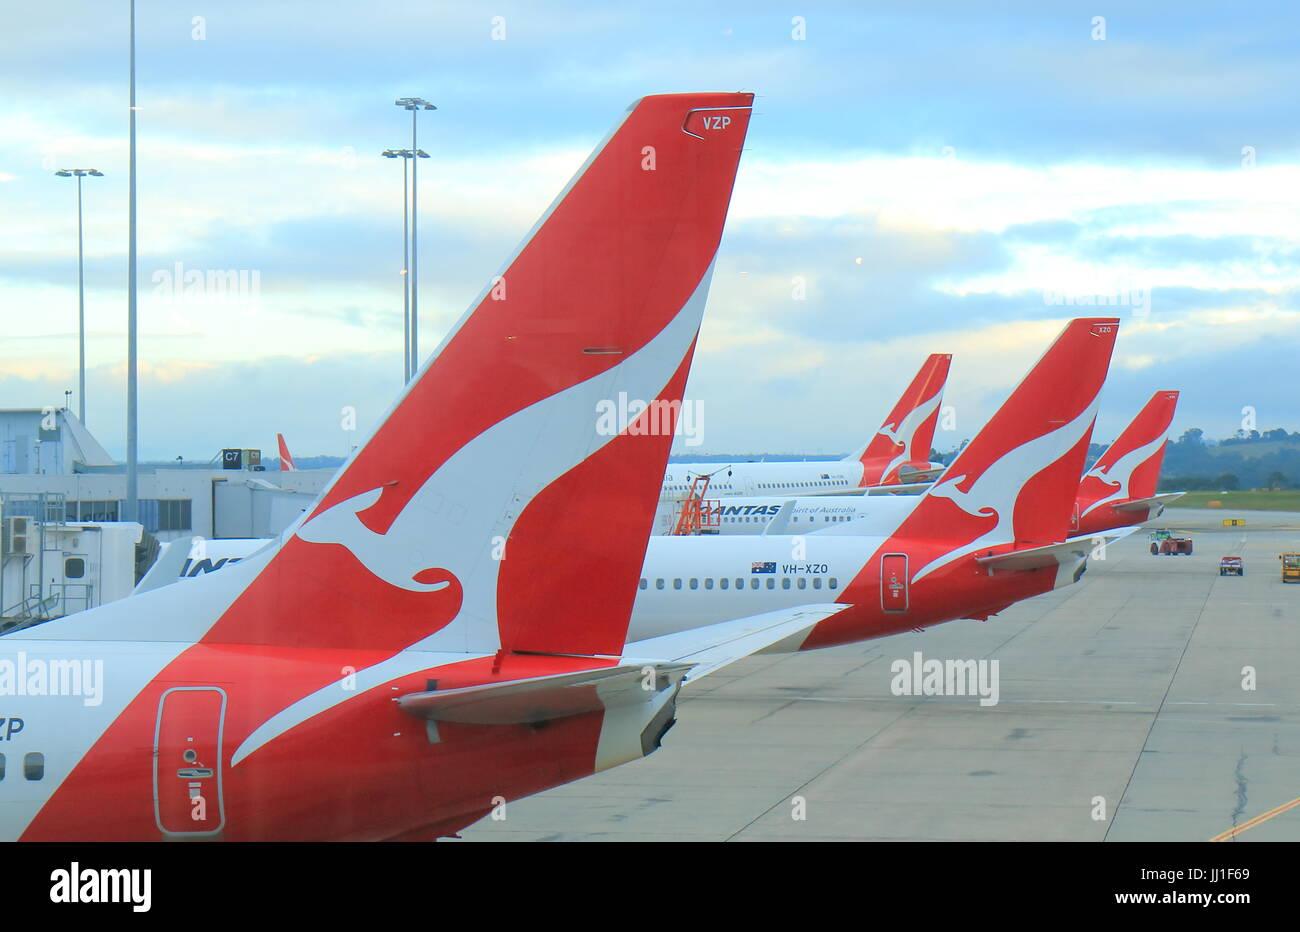 Qantas airplanes wait for departure at Melbourne Airport Australia. - Stock Image